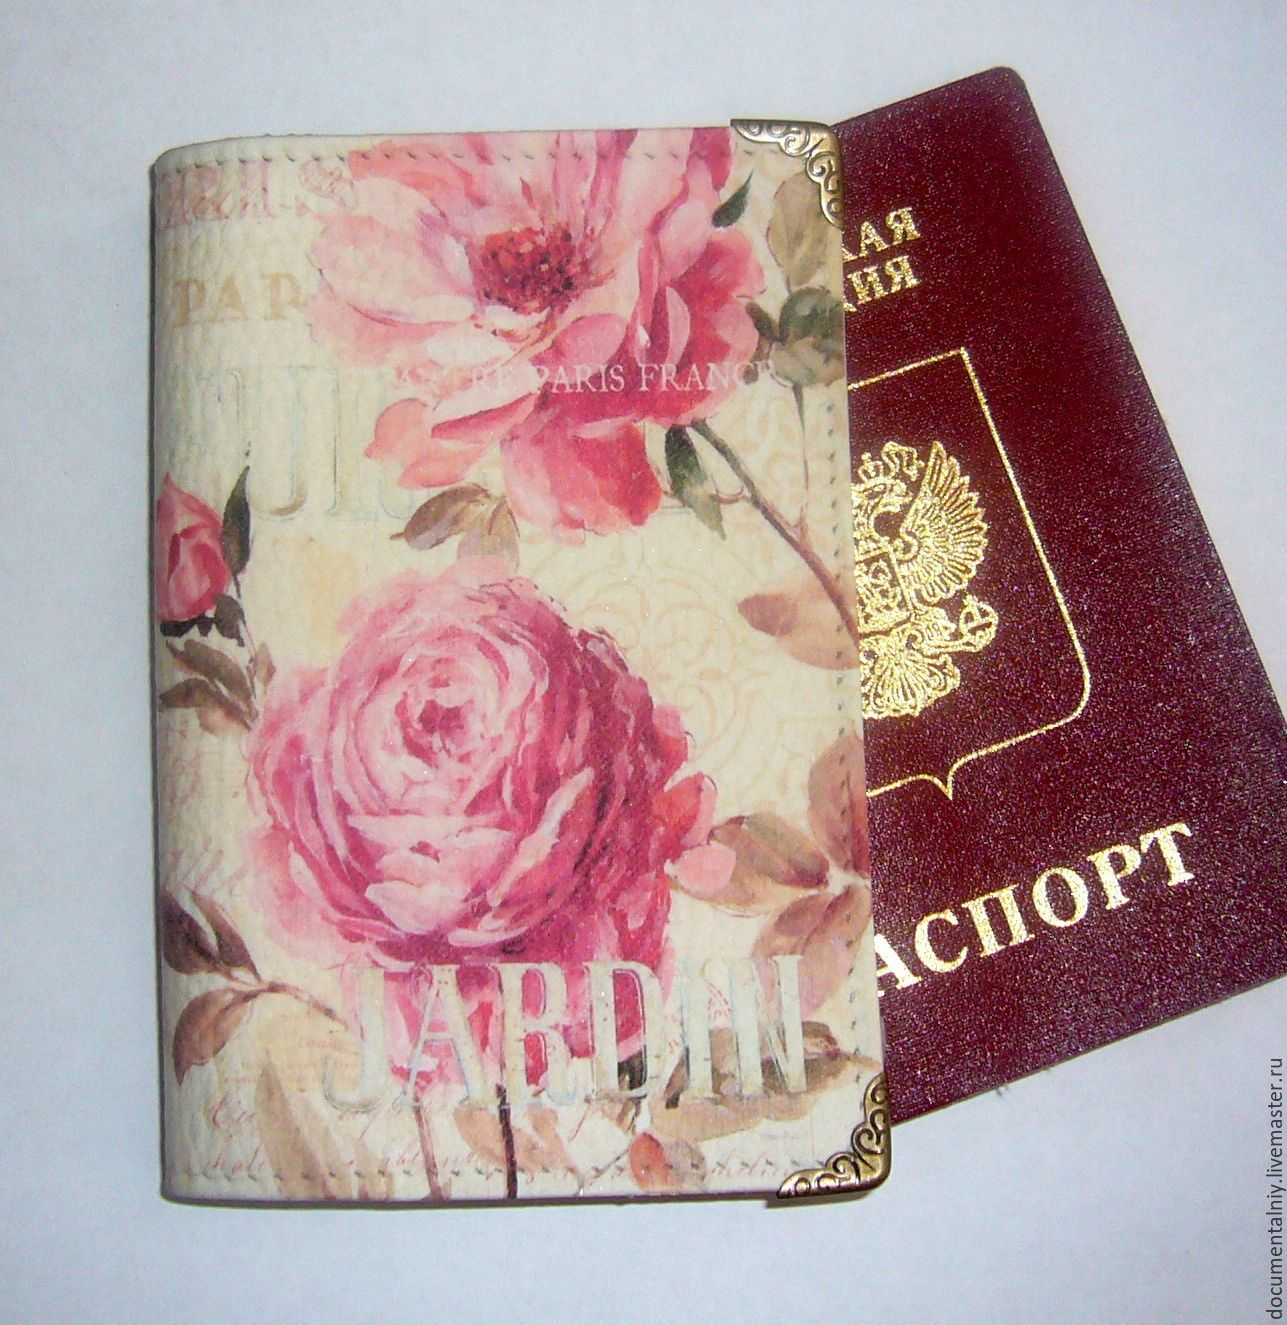 Passport cover or avtodokumentov, series 'Lisa Audit', Cover, Obninsk,  Фото №1